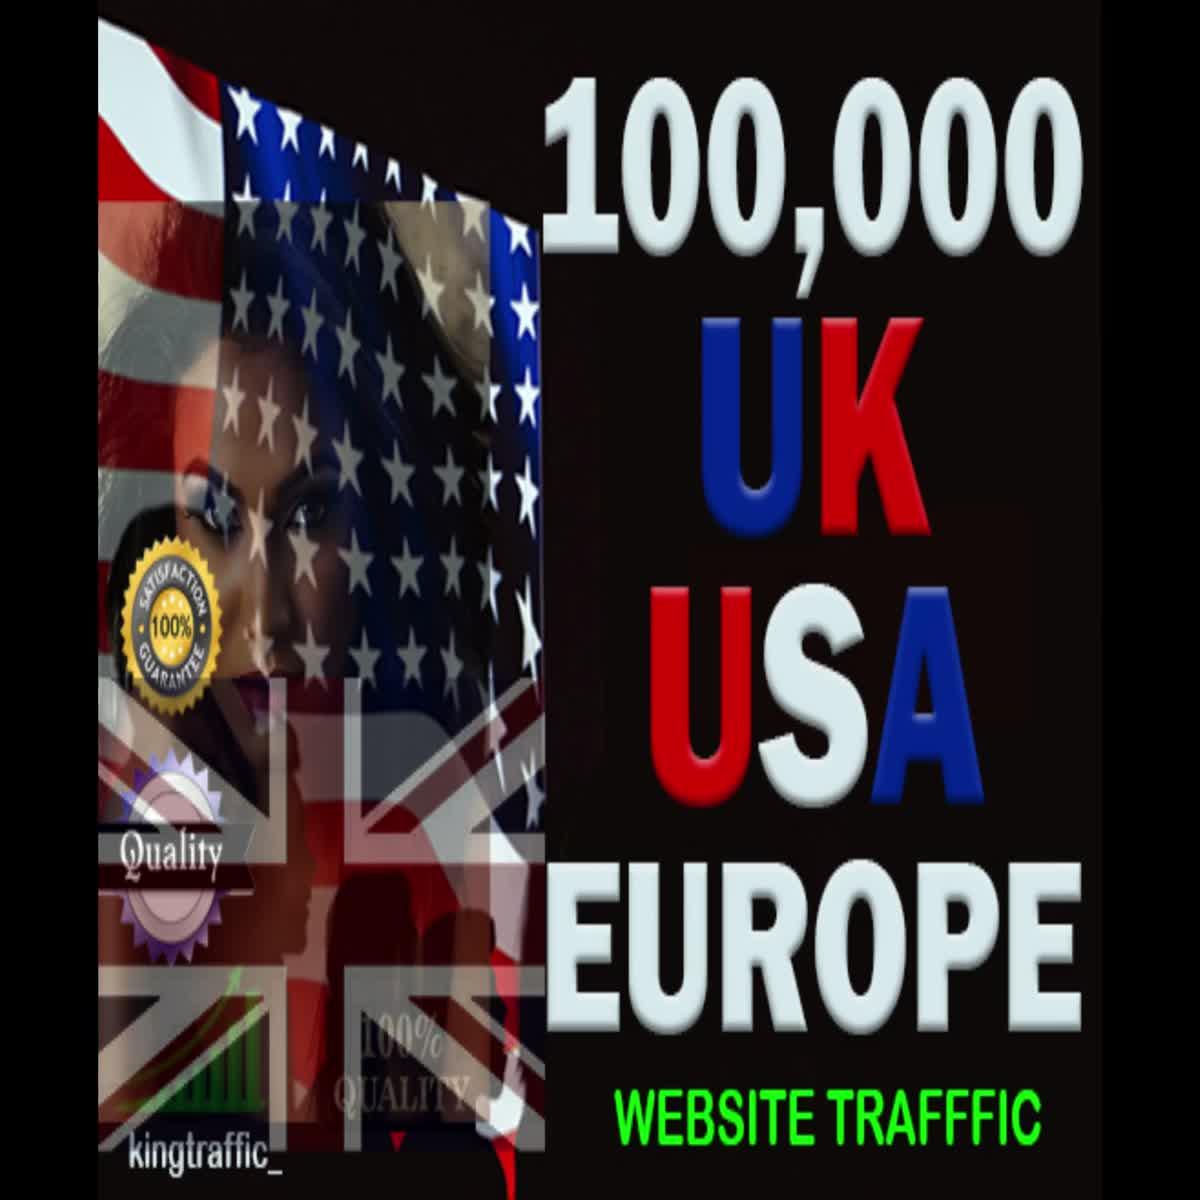 100,000 High quality UK, USA, Europe keyword target website traffic